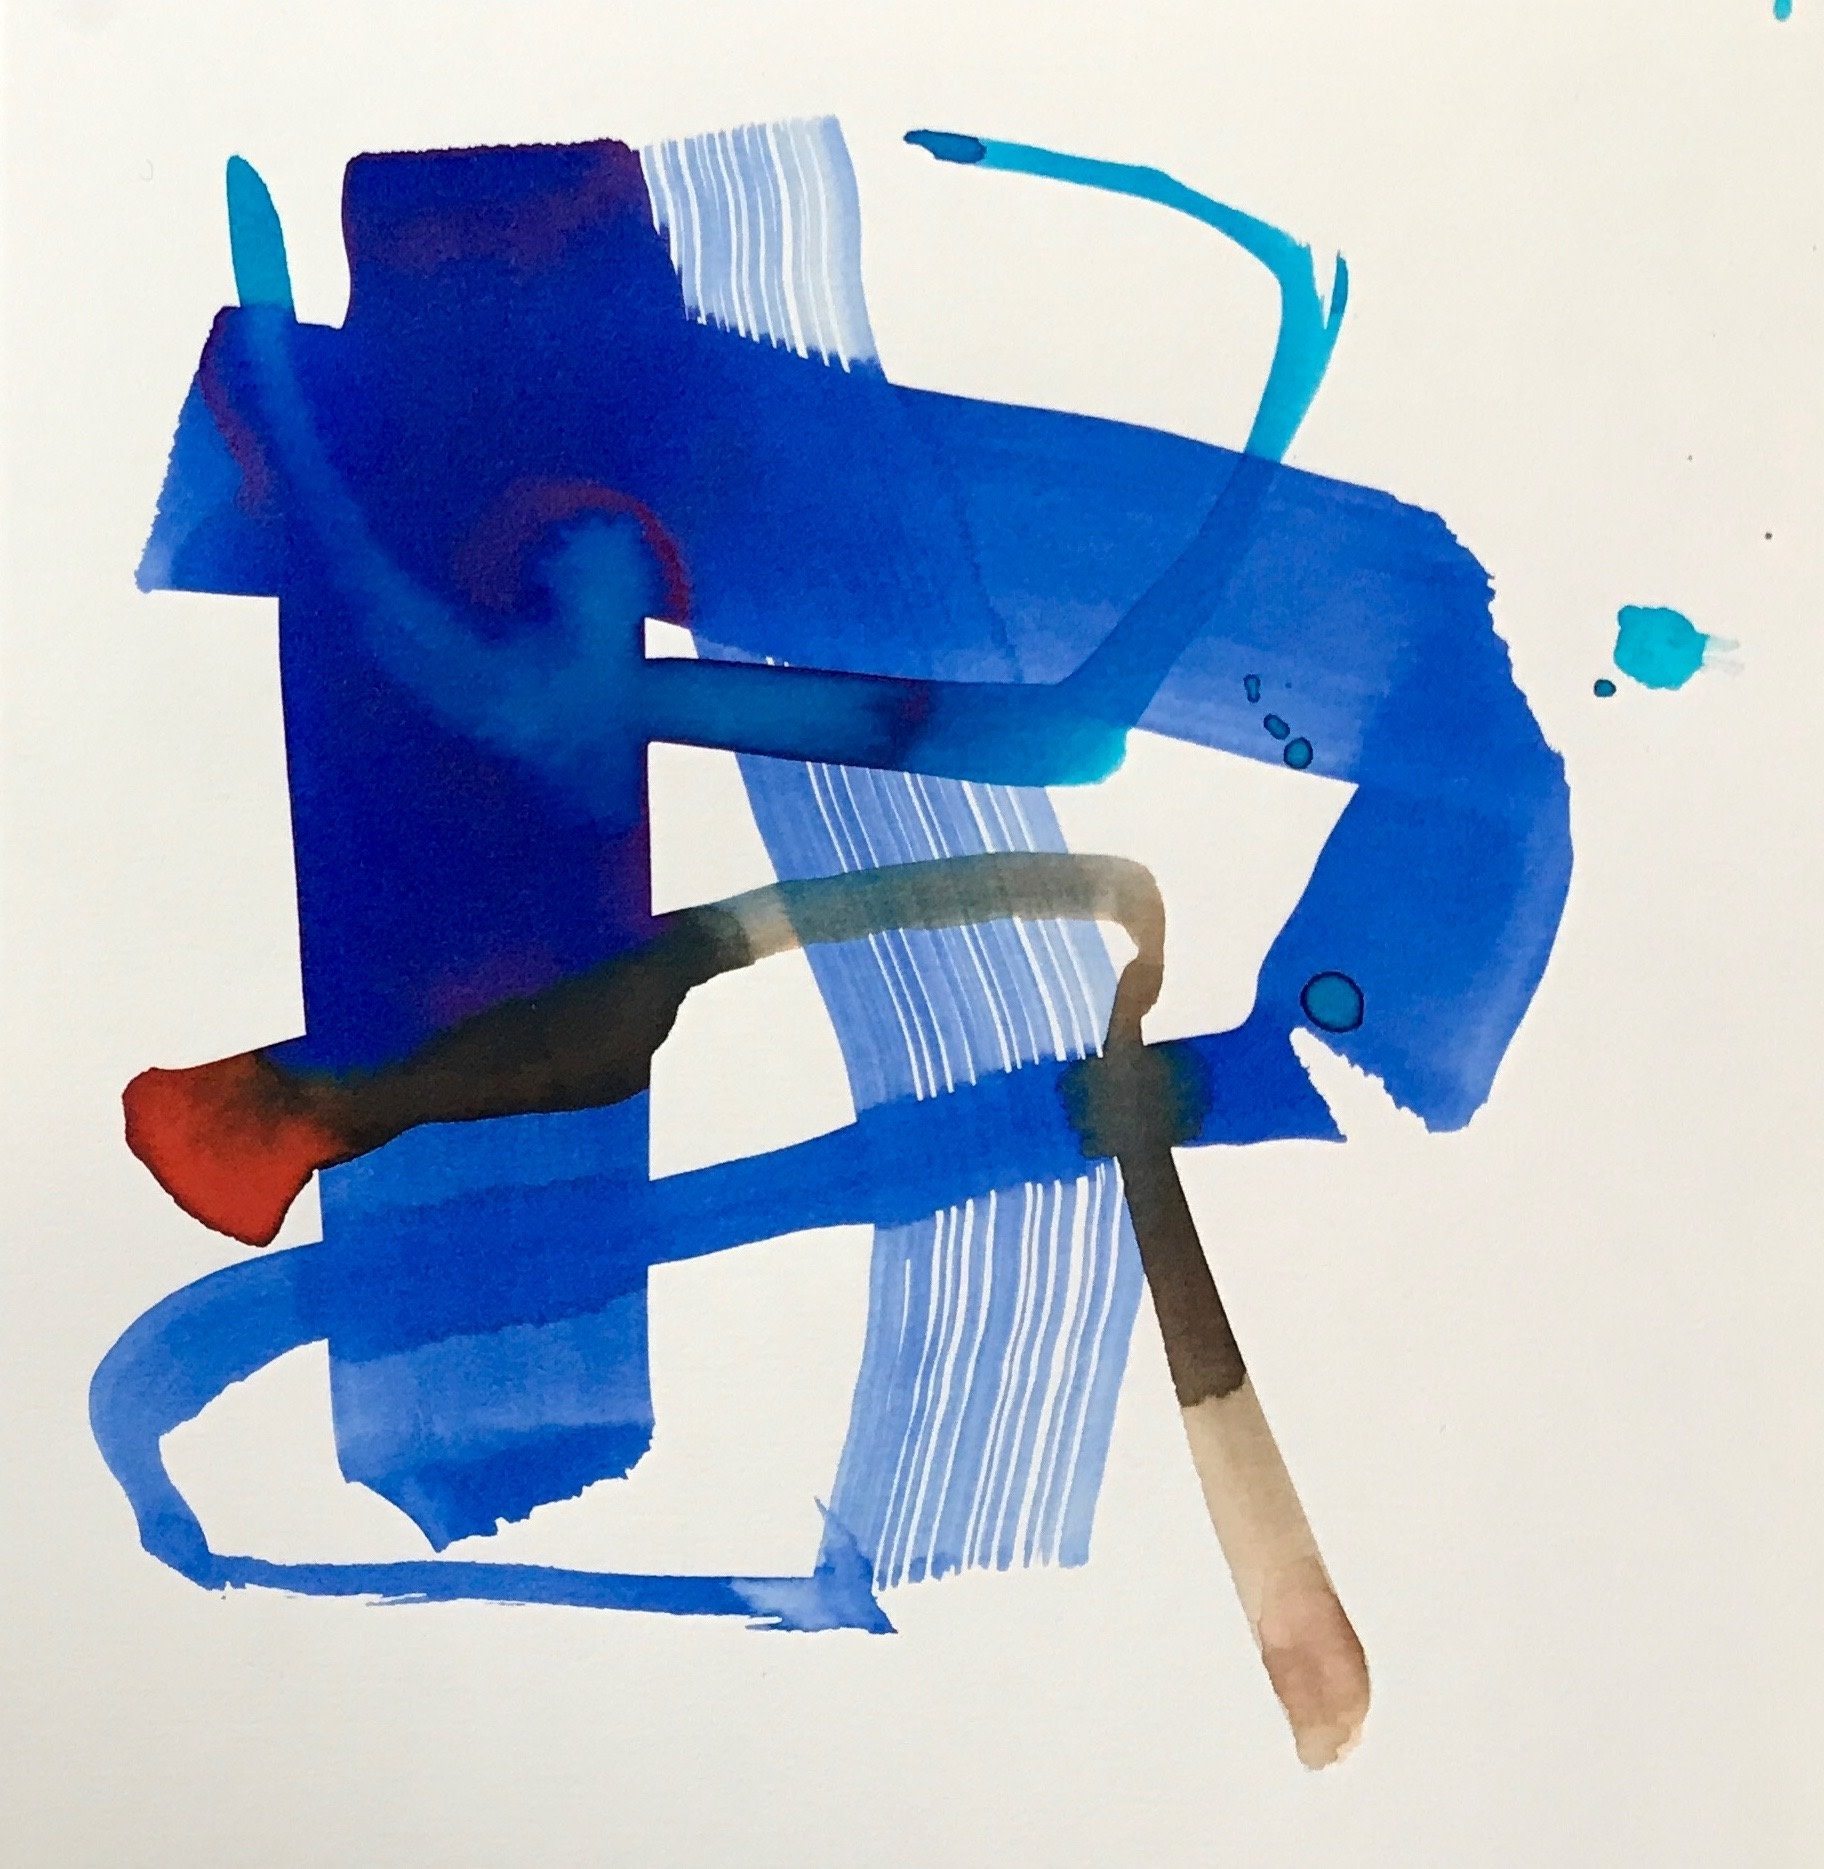 <span class=&#34;link fancybox-details-link&#34;><a href=&#34;/exhibitions/24/works/artworks_standalone10734/&#34;>View Detail Page</a></span><div class=&#34;artist&#34;><span class=&#34;artist&#34;><strong>Jane Lewis</strong></span></div><div class=&#34;title&#34;><em>Forge</em></div><div class=&#34;medium&#34;>ink</div><div class=&#34;dimensions&#34;>34x34cm</div>